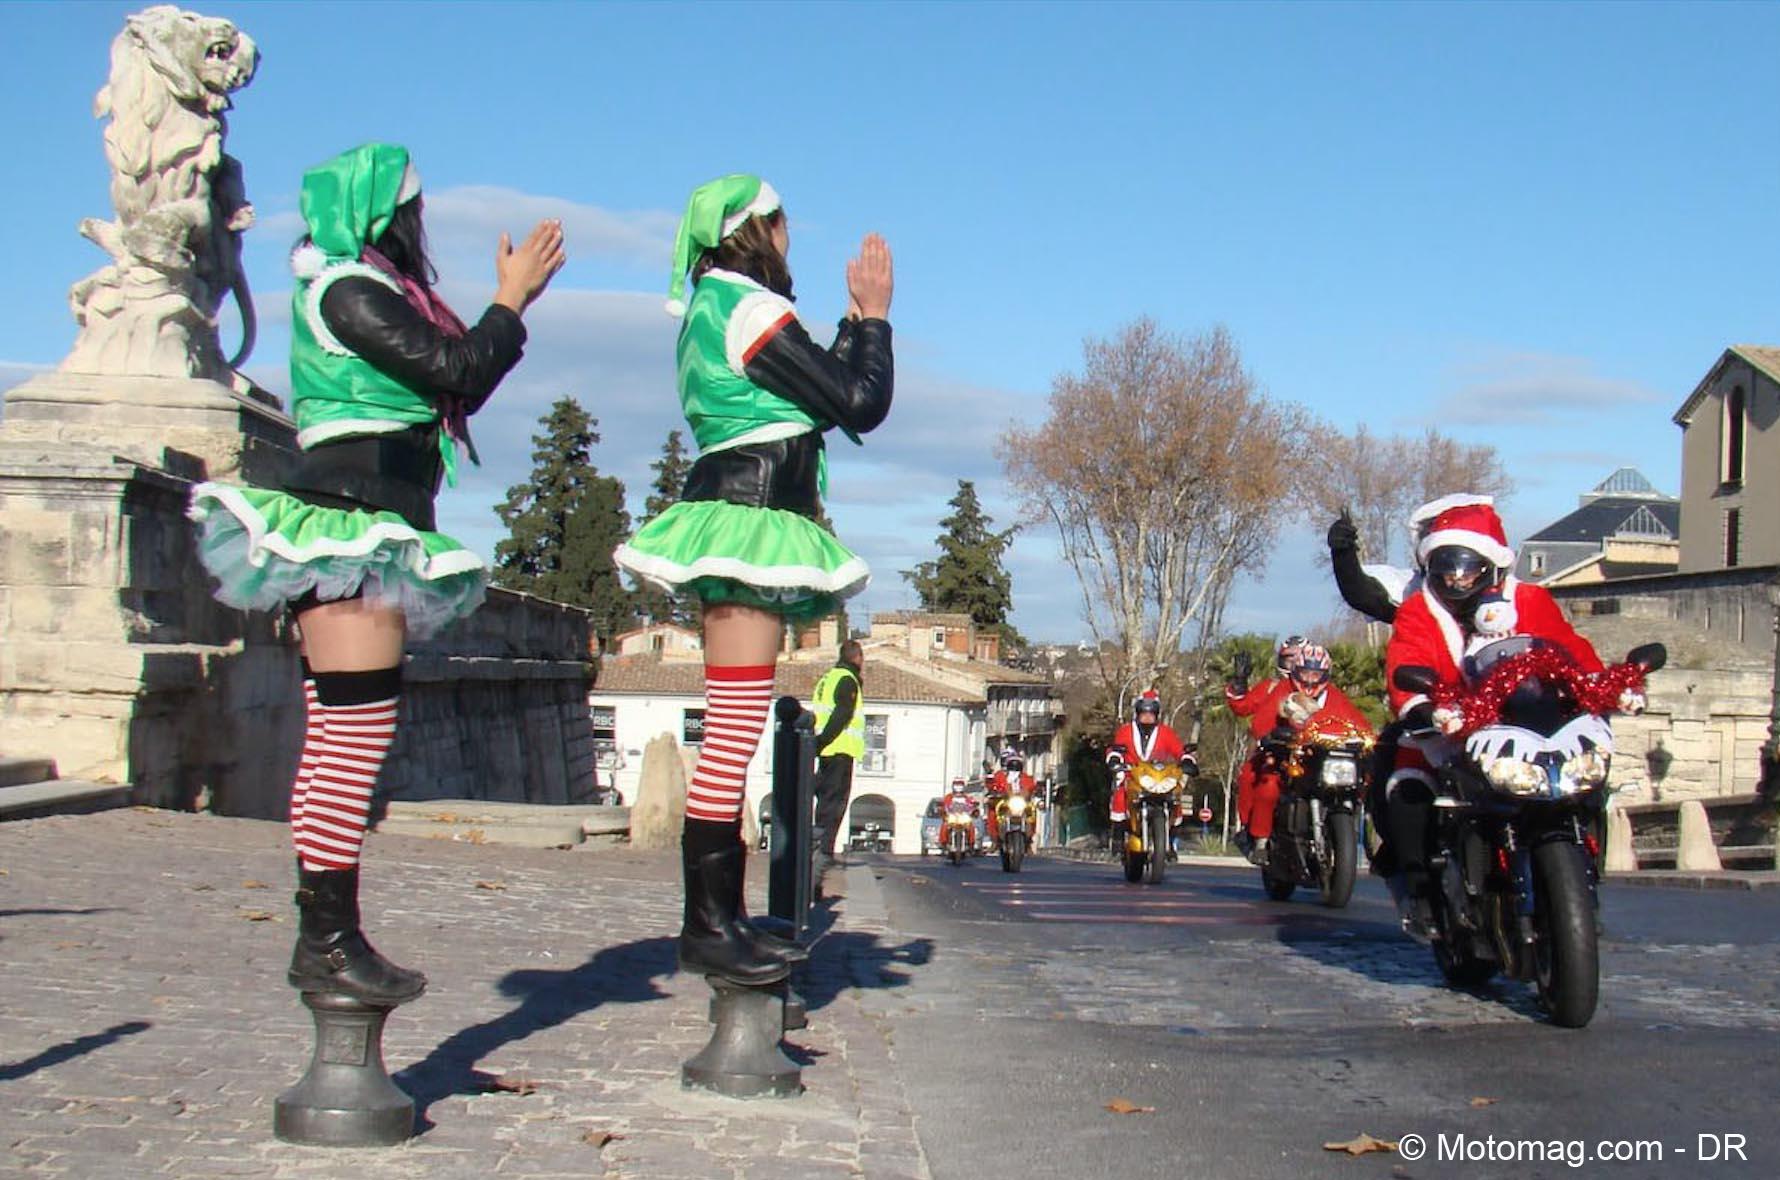 balade moto noel paris 2018 Balade moto de Noël Fun Easy Bike à Montpellier (Hérault)   Moto  balade moto noel paris 2018